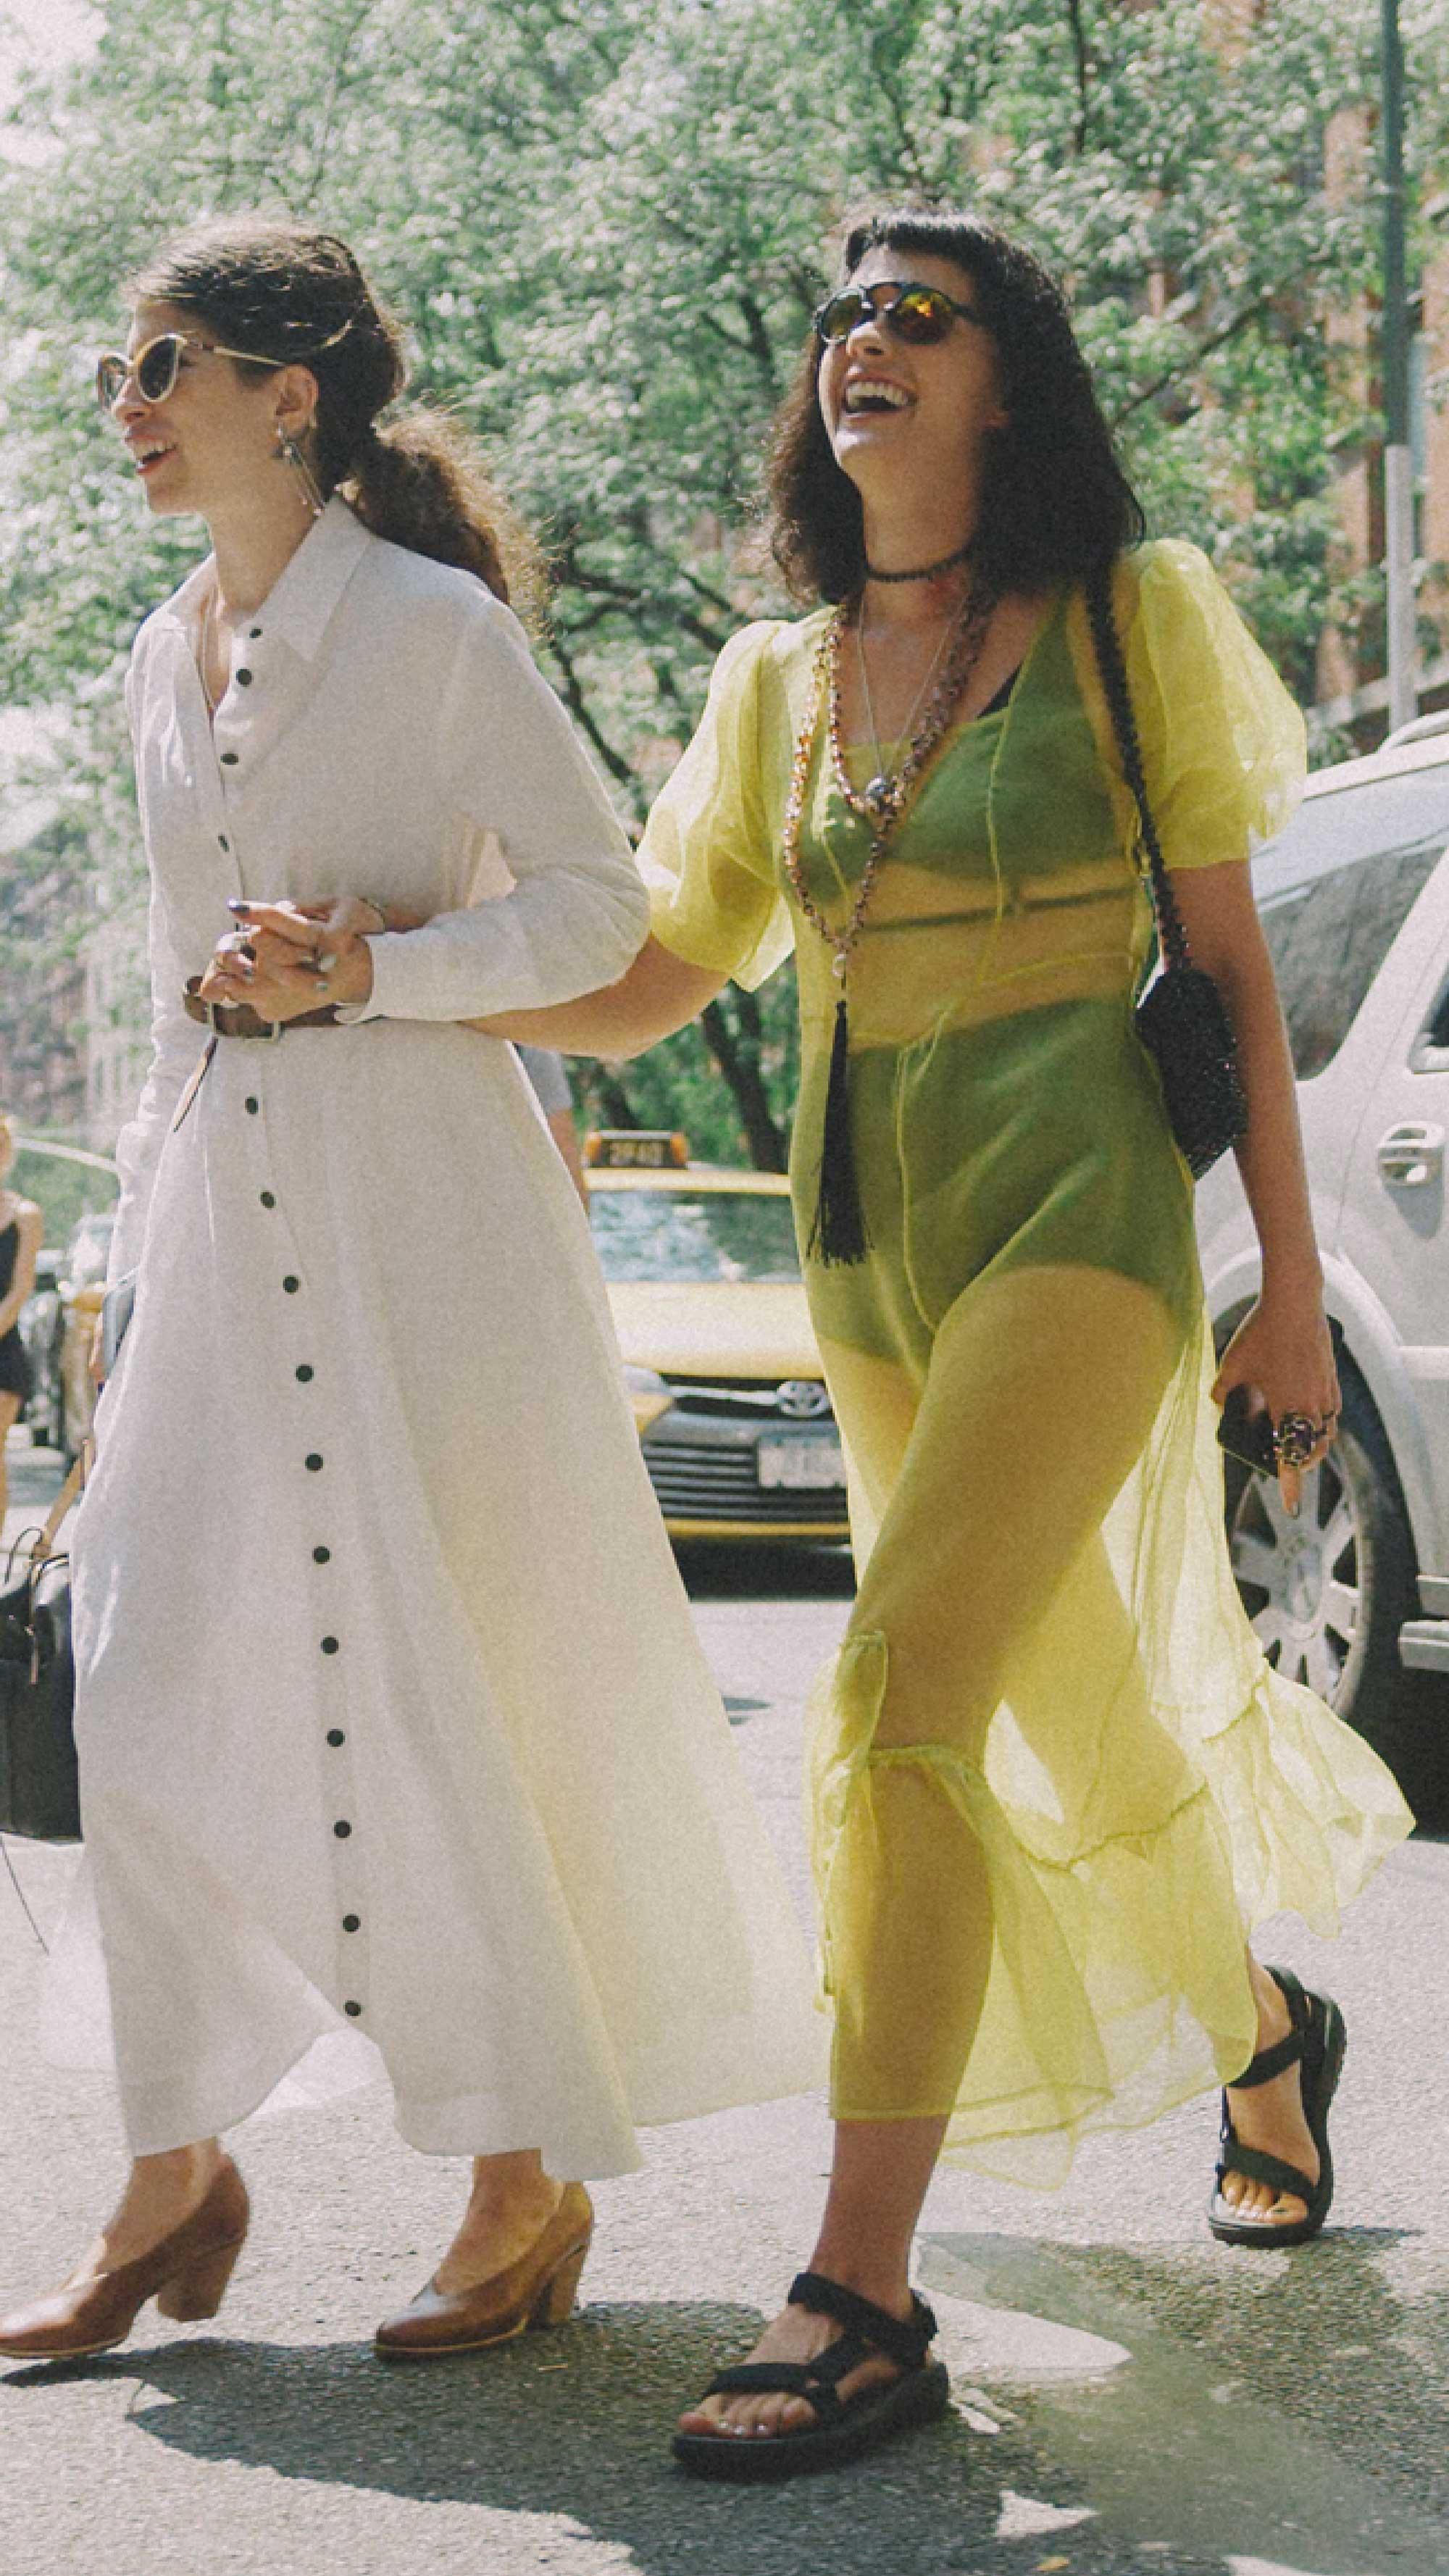 New-York-Fashion-Week-NYFW-SS18-street-style-day-one4.jpg